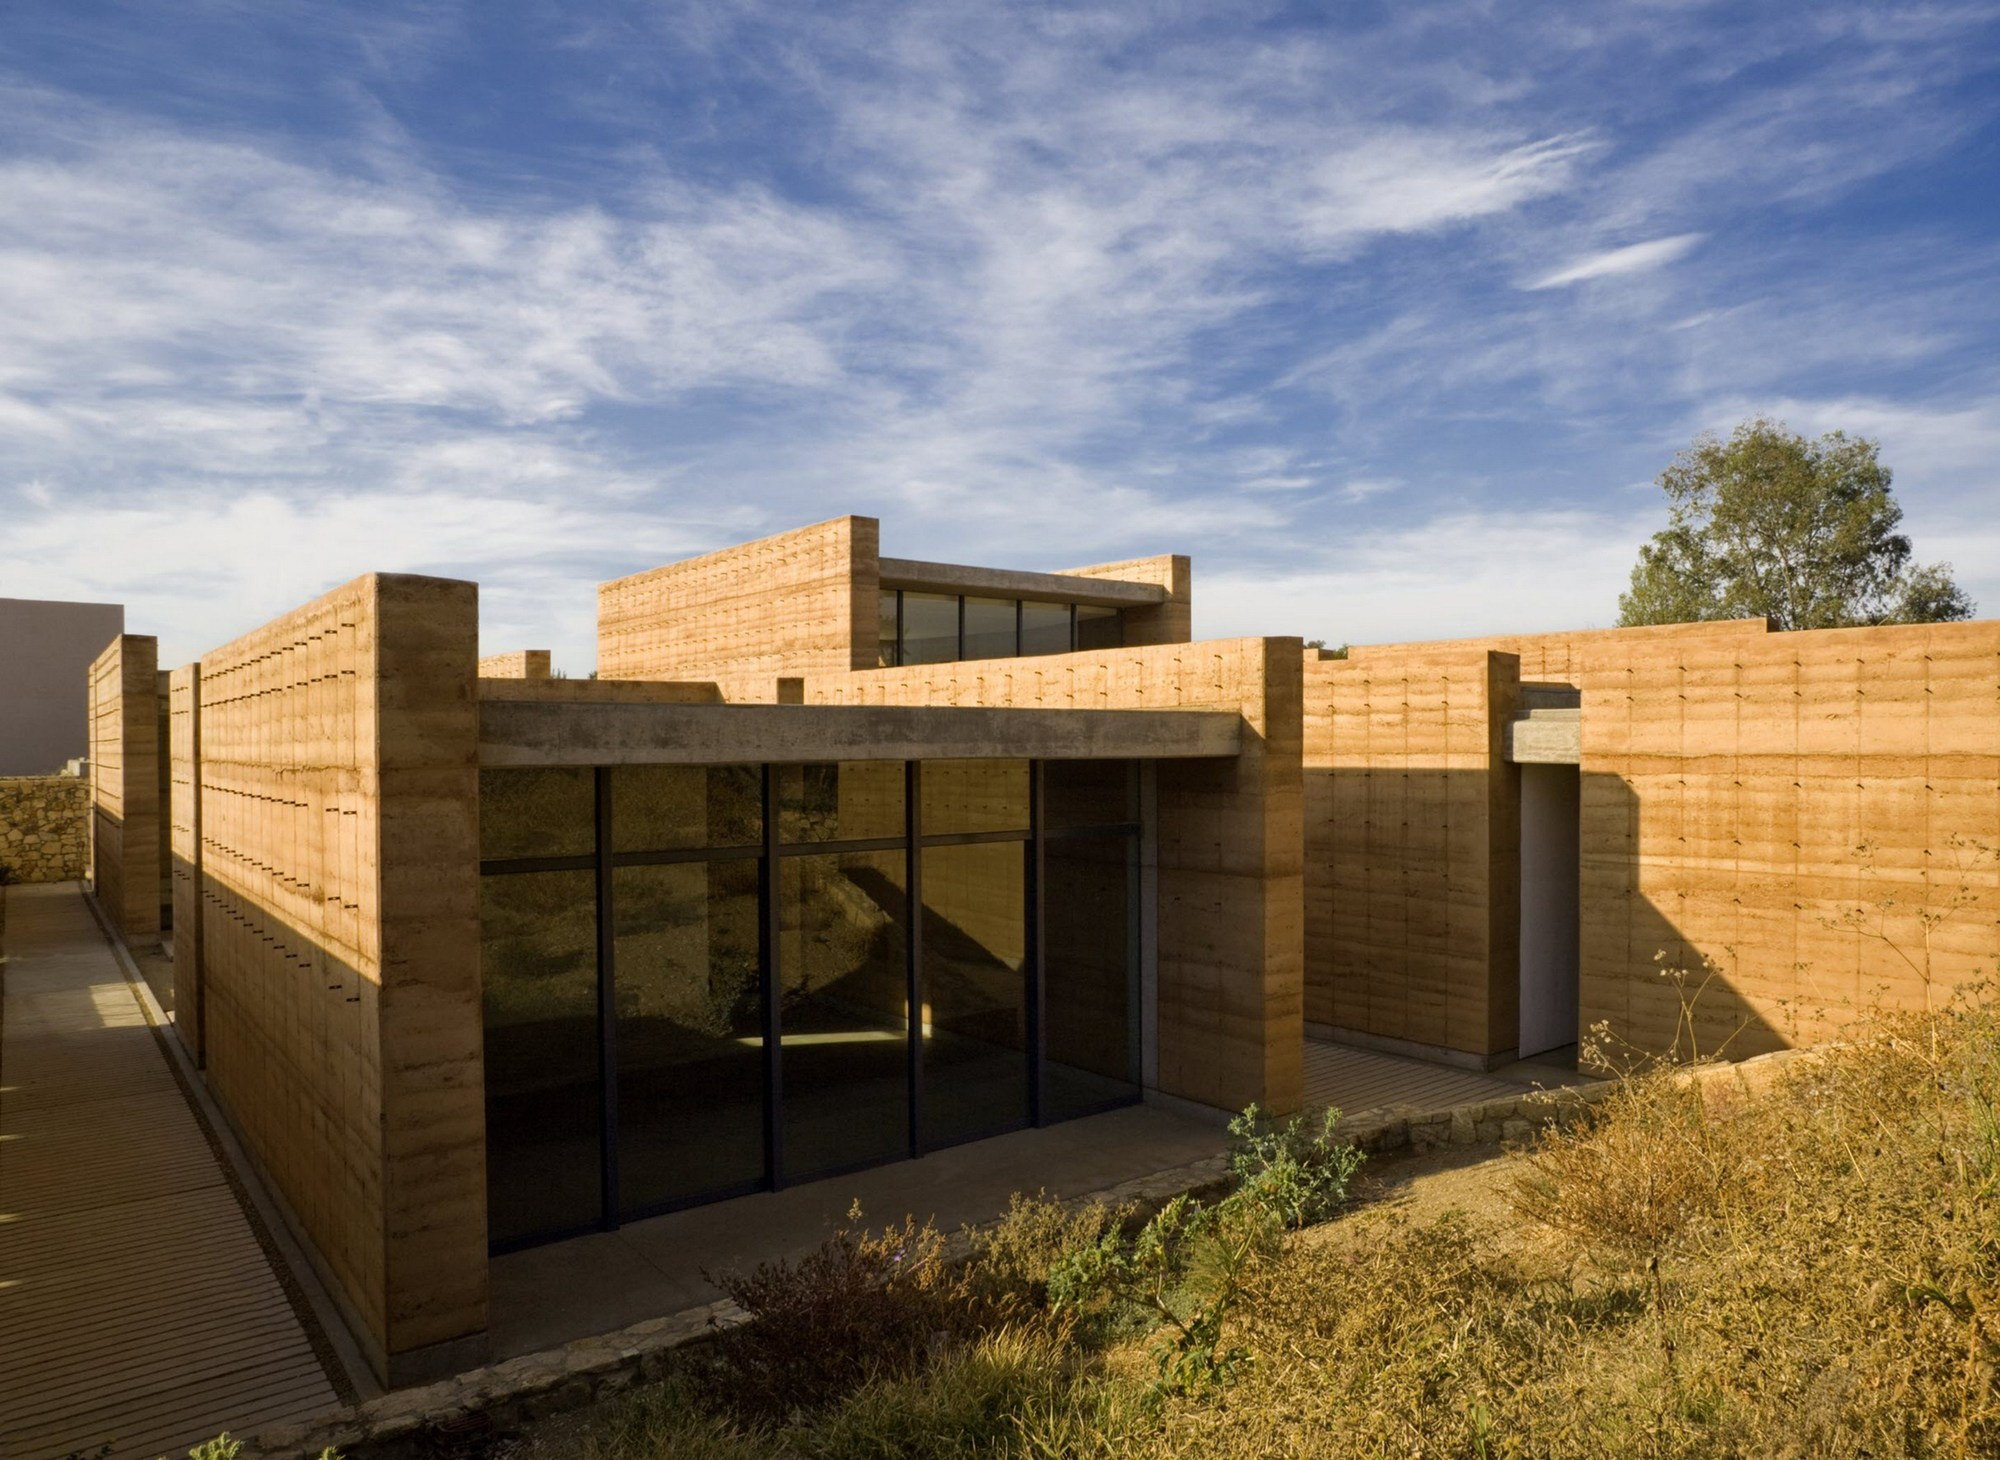 Escuela de artes visuales de oaxaca taller de for Plataforma arquitectura